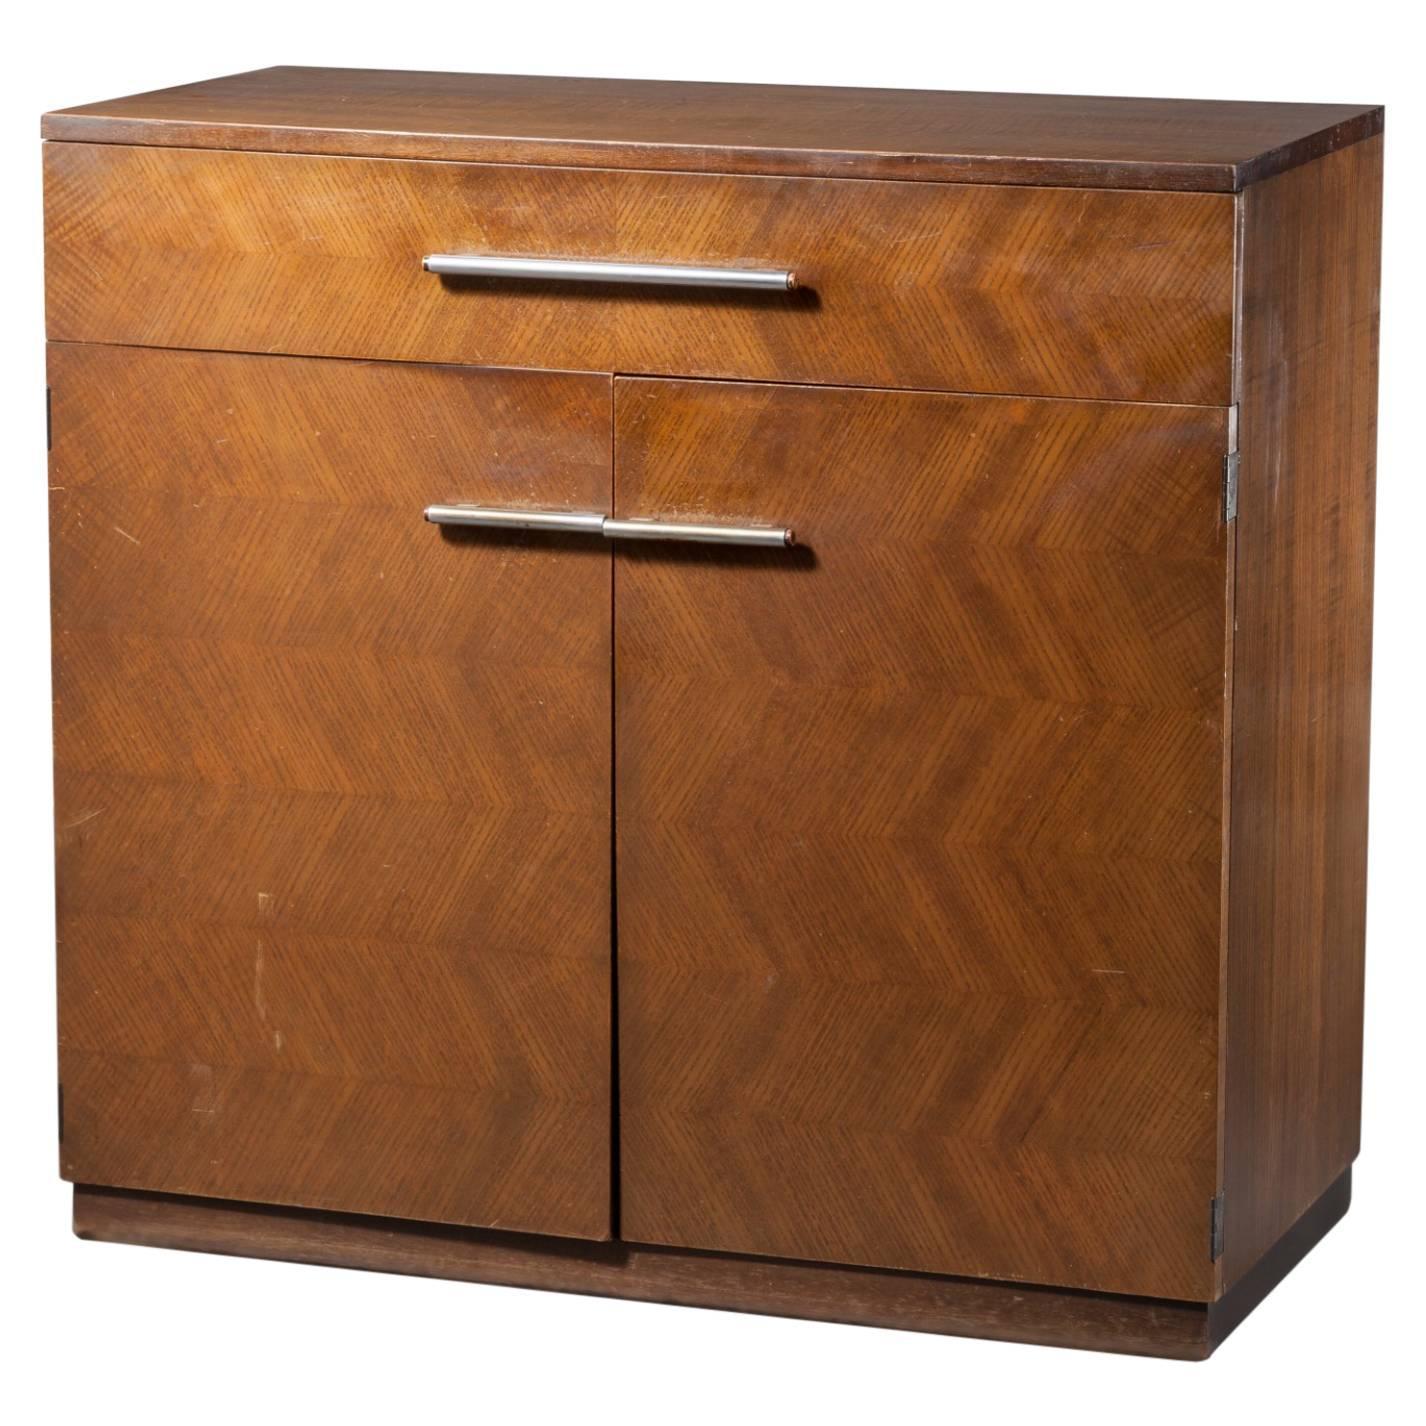 American Furniture Warehouse Gilbert: Gilbert Rohde Design For Living By Herman Miller Dresser